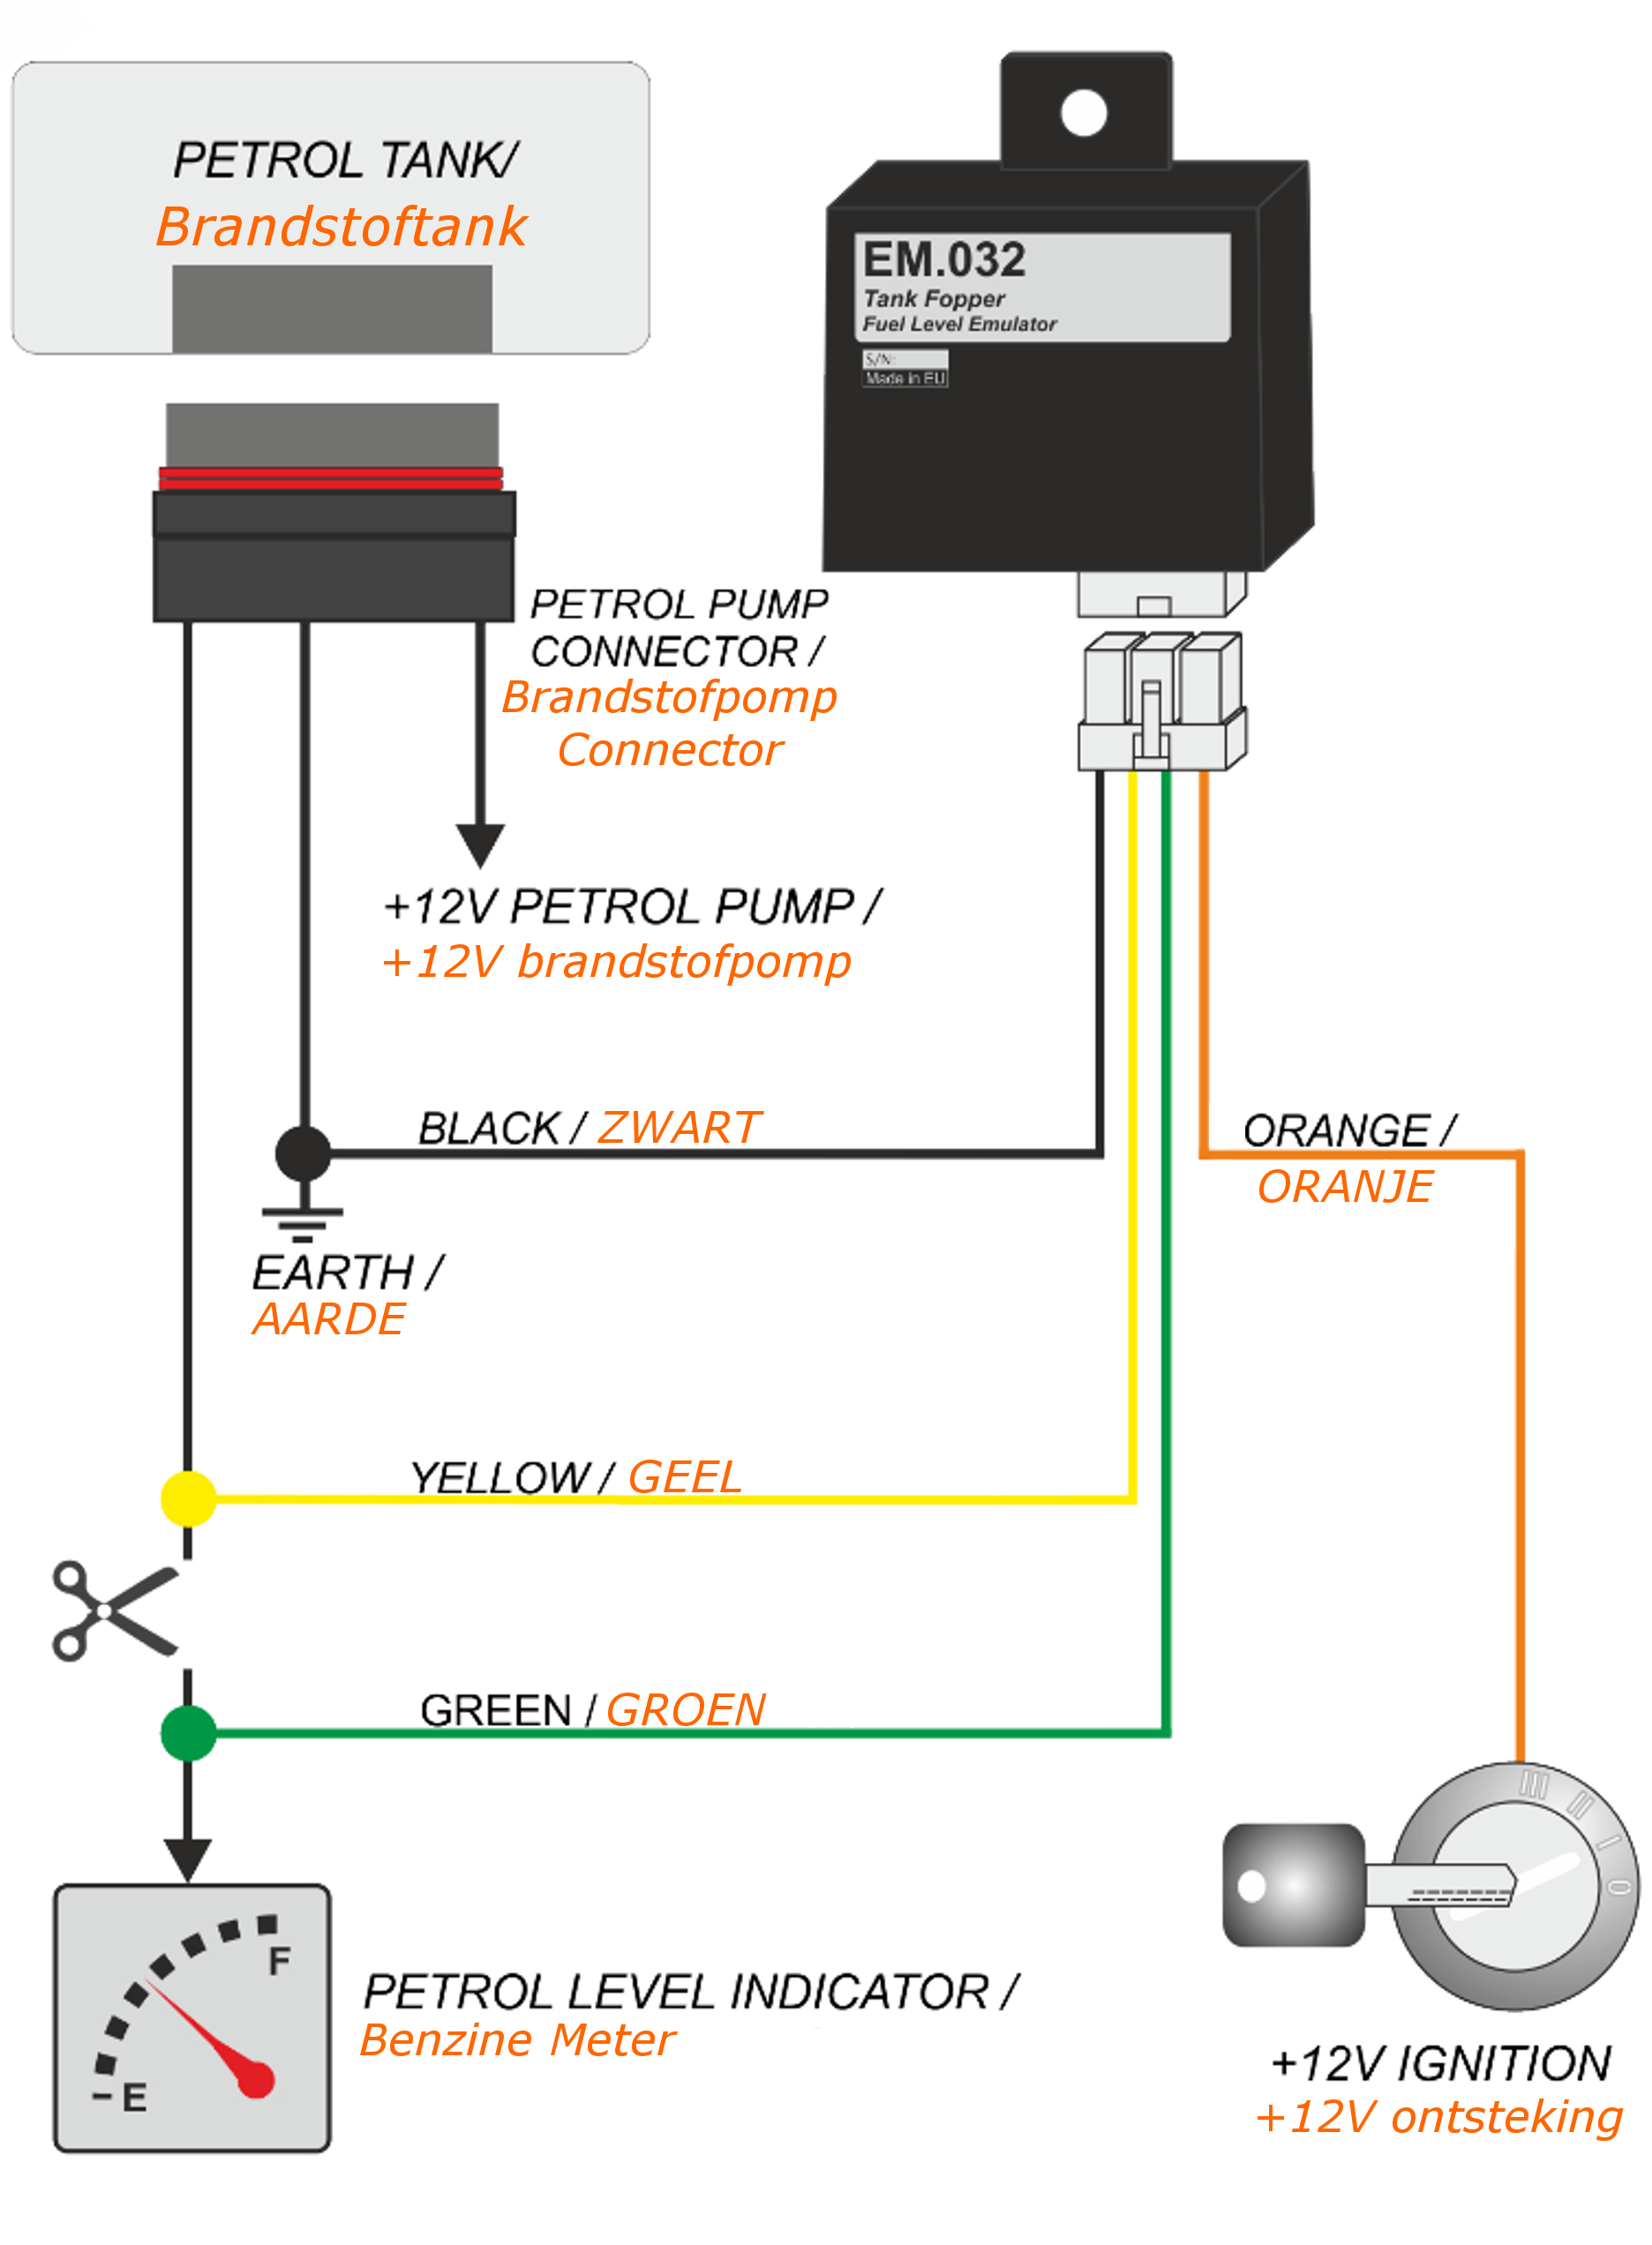 Brandstofniveau Emulator (EM.032.1)